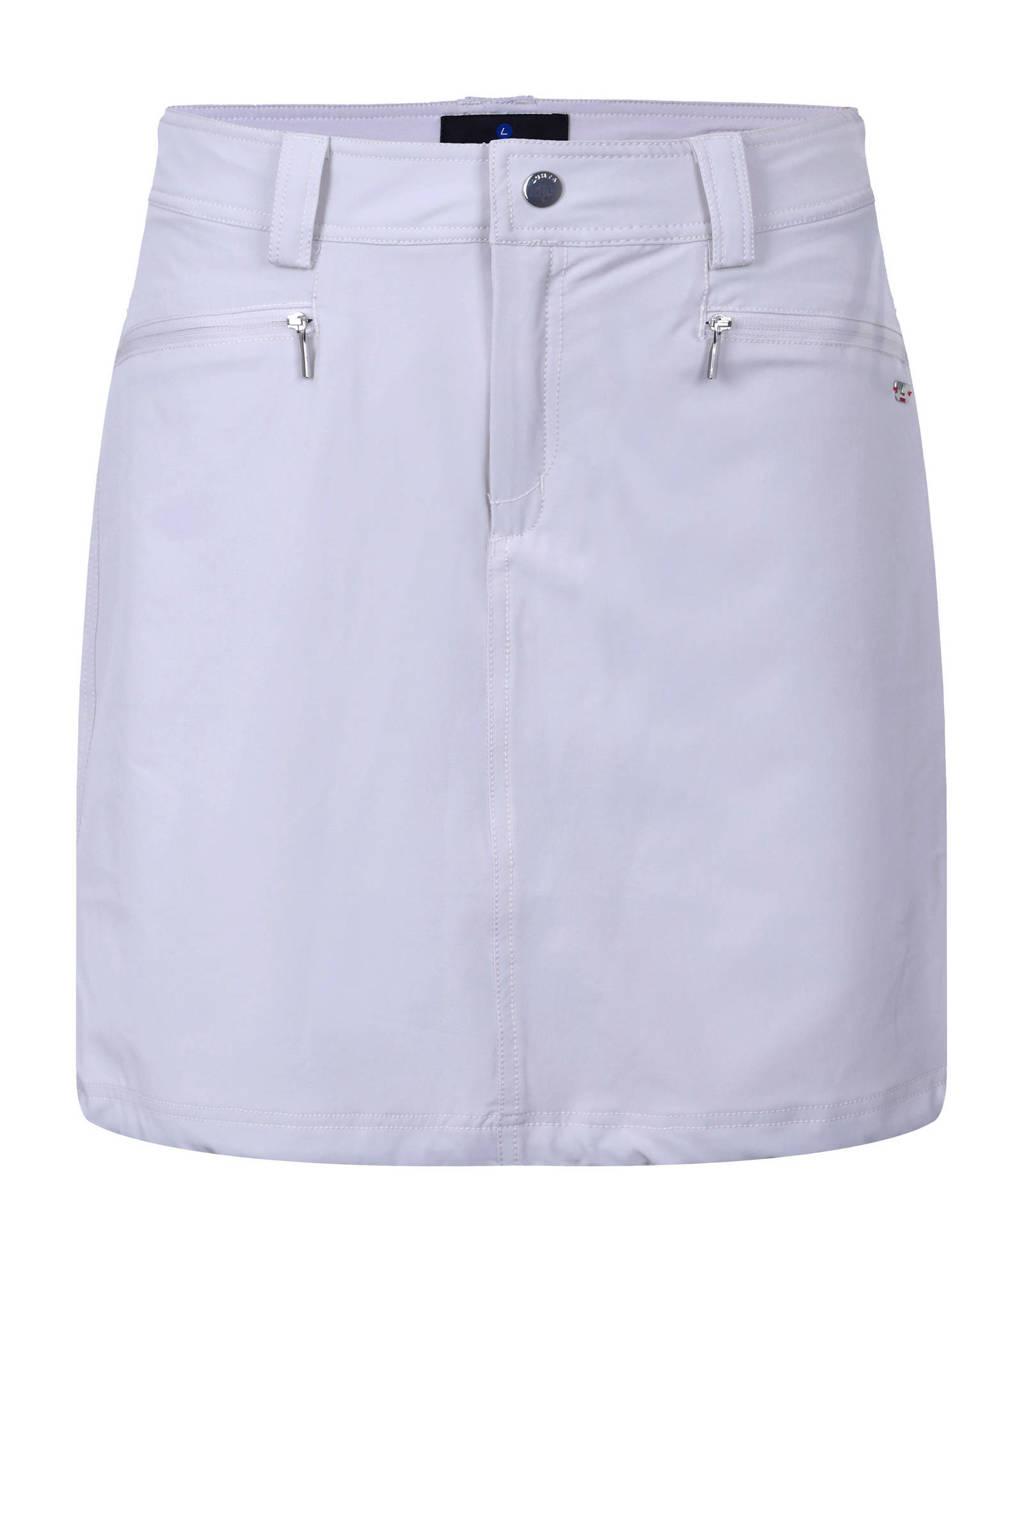 Luhta outdoor rok Ruusa L2 wit, Natural White